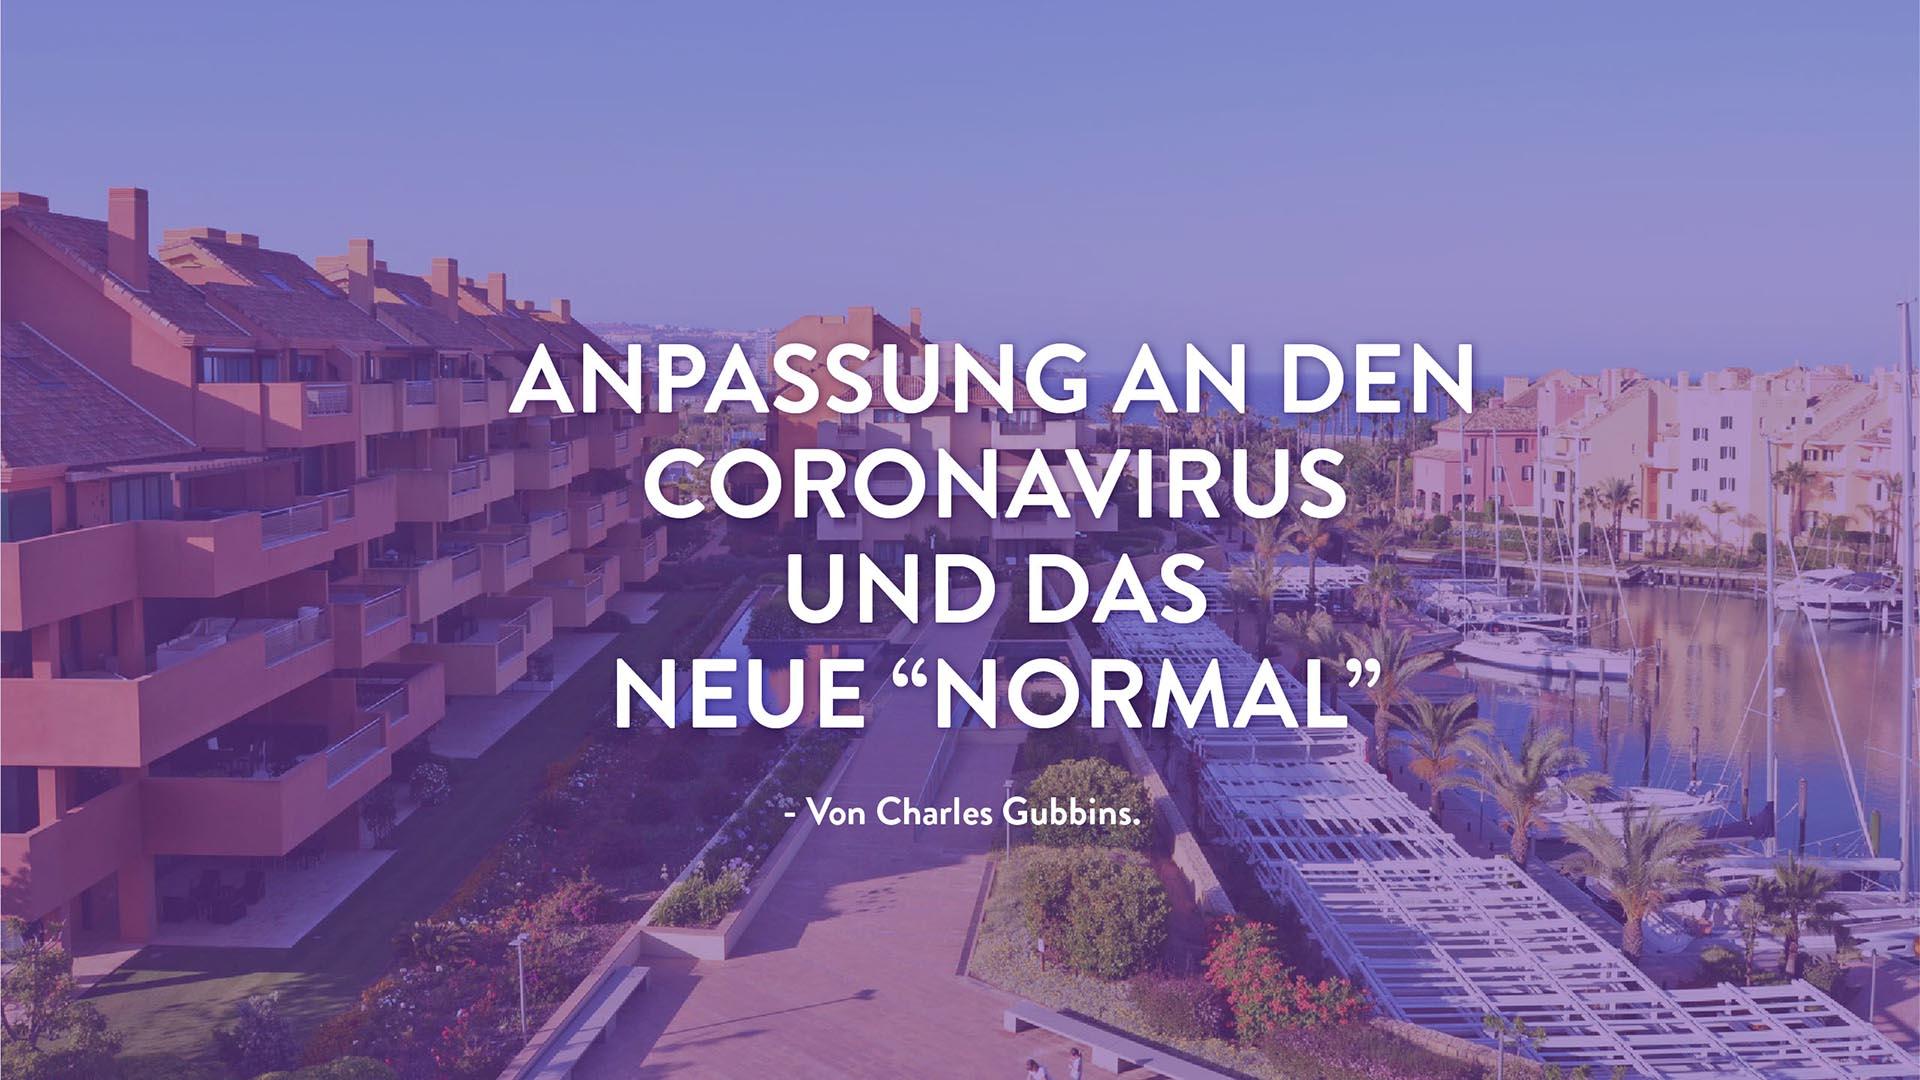 anpassung-an-das-coronavirus-und-das-new-normal-sotogrande-noll-immobilien-blog-2020-99